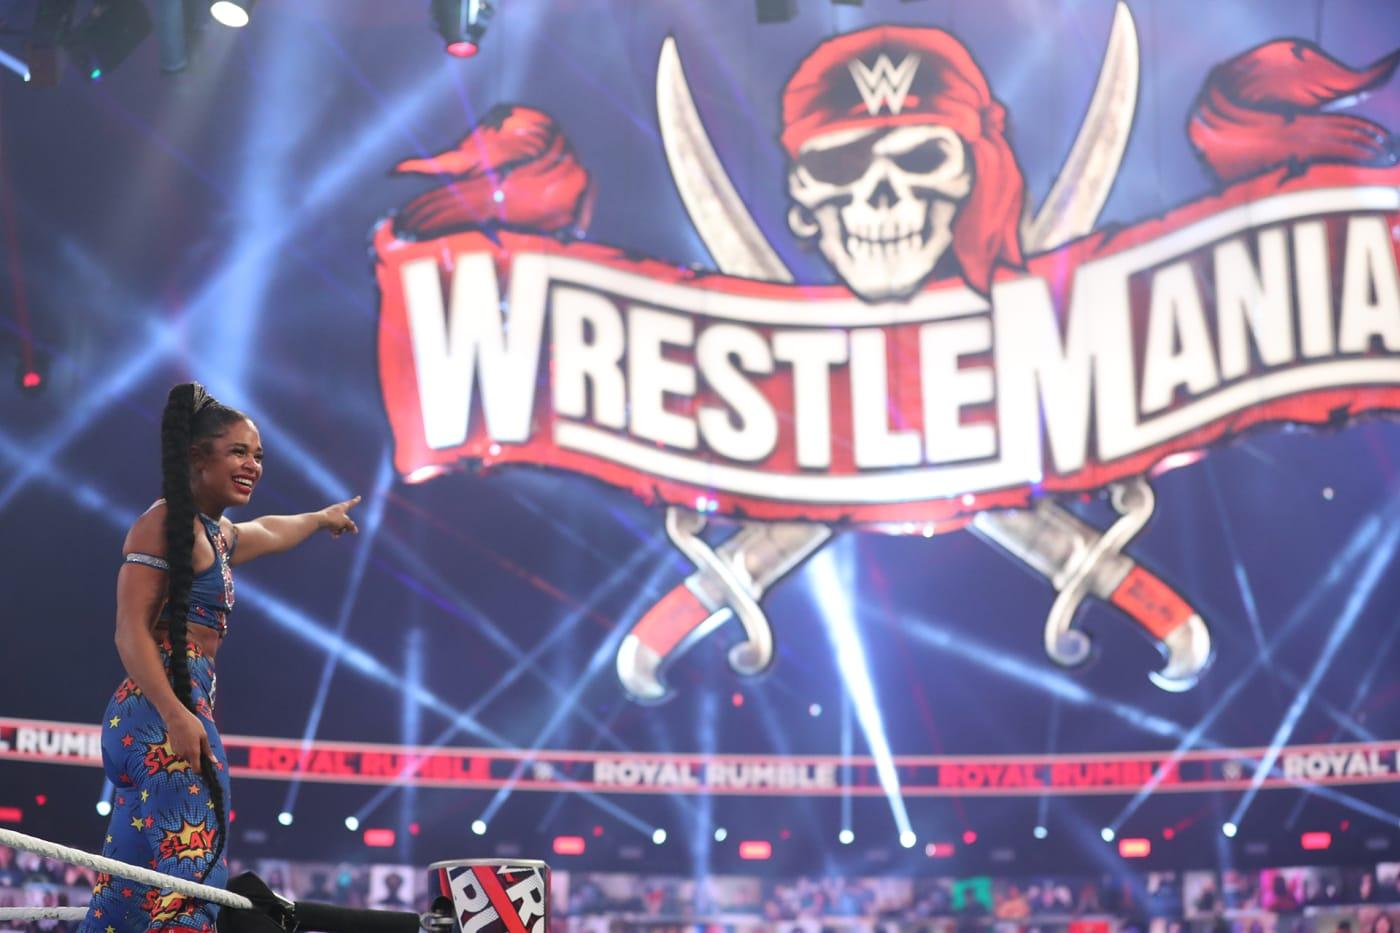 Bianca Belair during the WWE Royal Rumble 2021